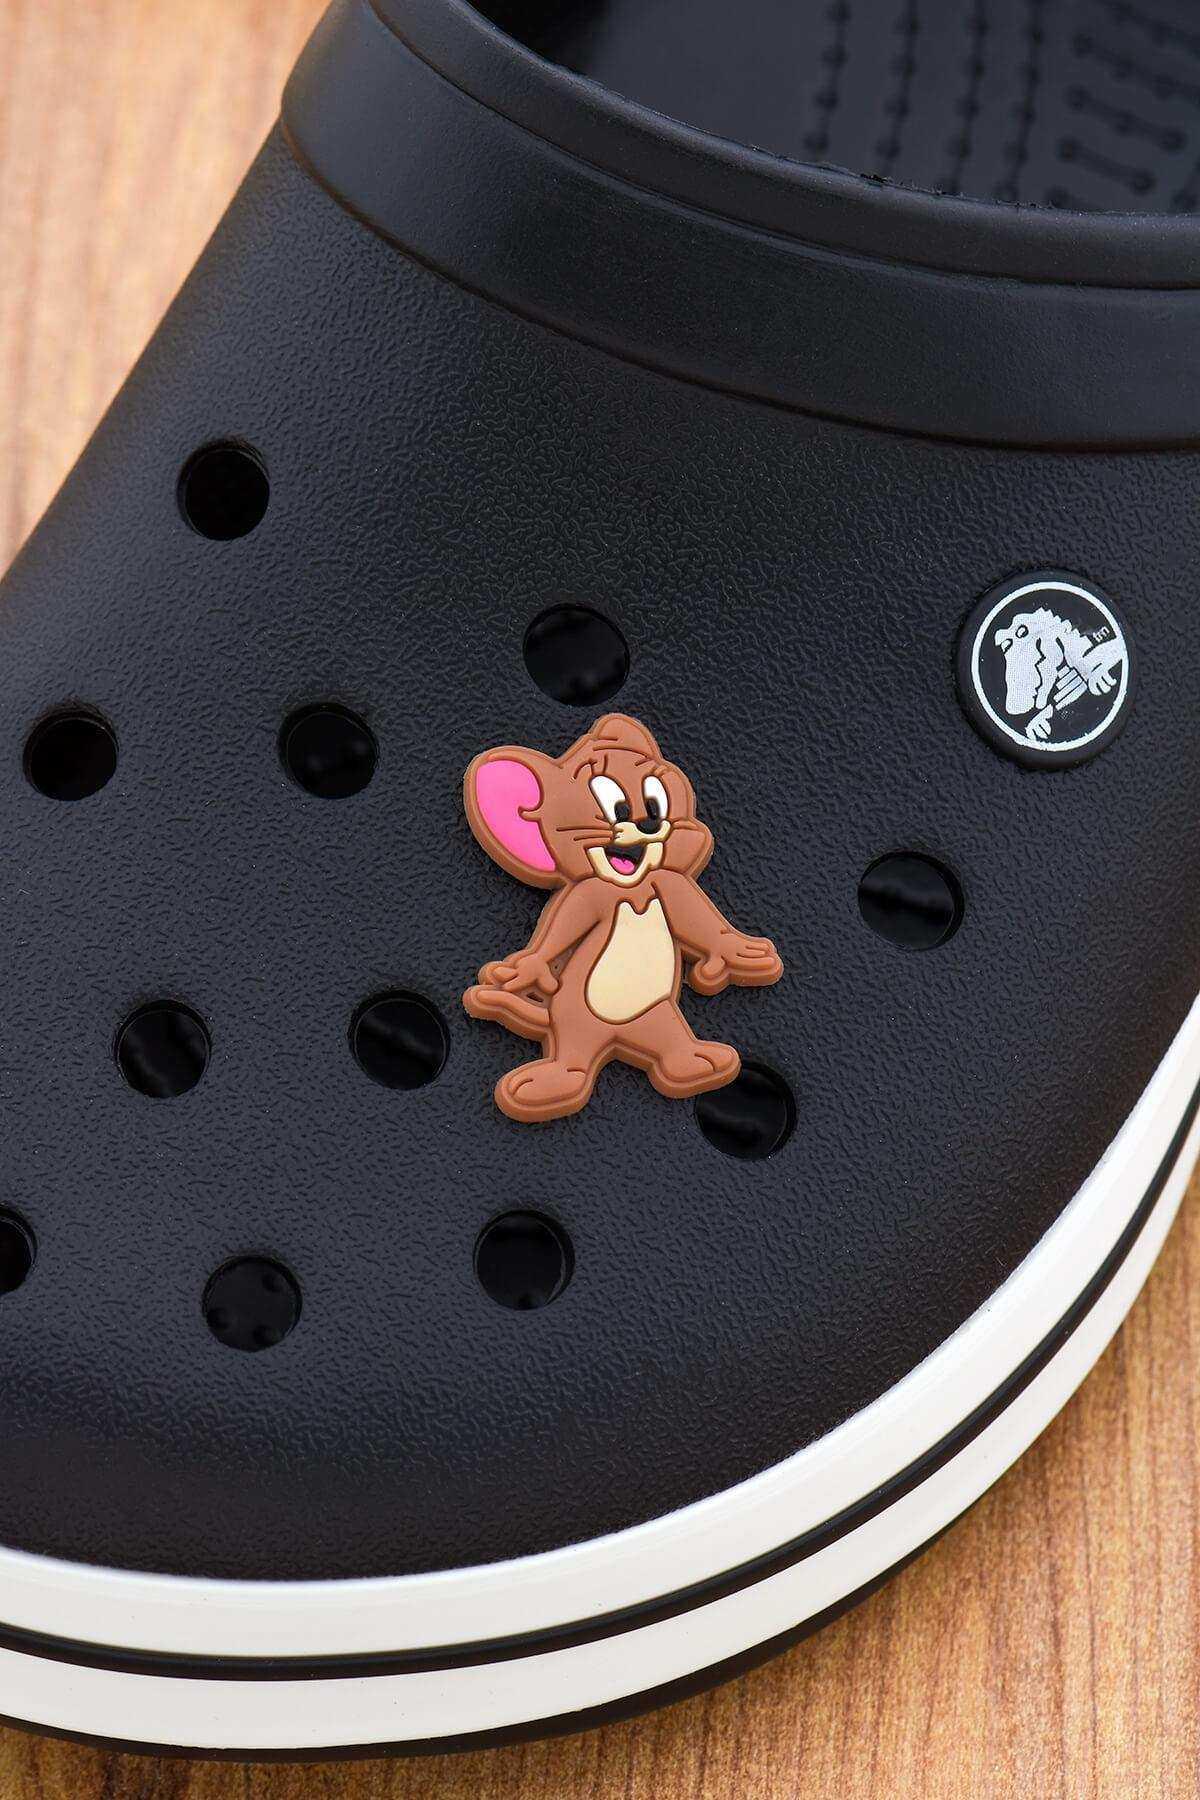 Tom ve Jerry Jibbitz Crocs Terlik Süsü Charm Terlik Aksesuarı - CRS0012